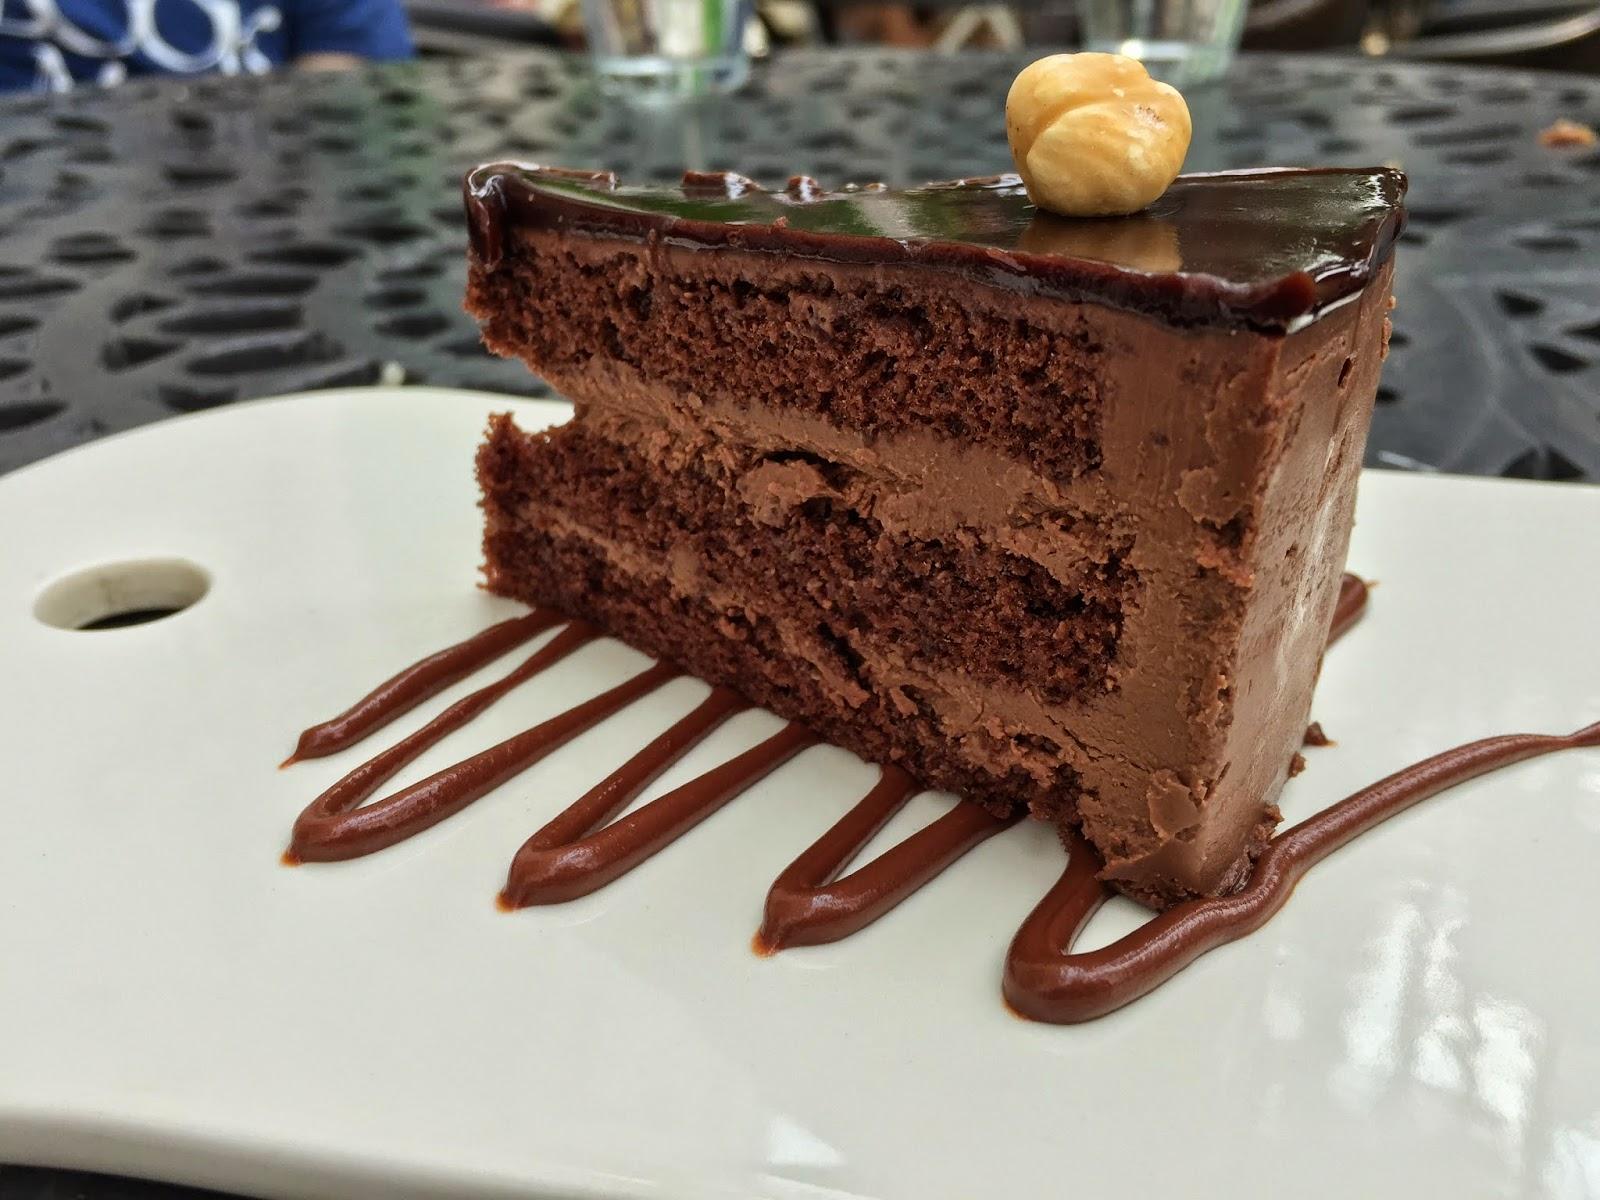 Symmetry - Chocolate Cake